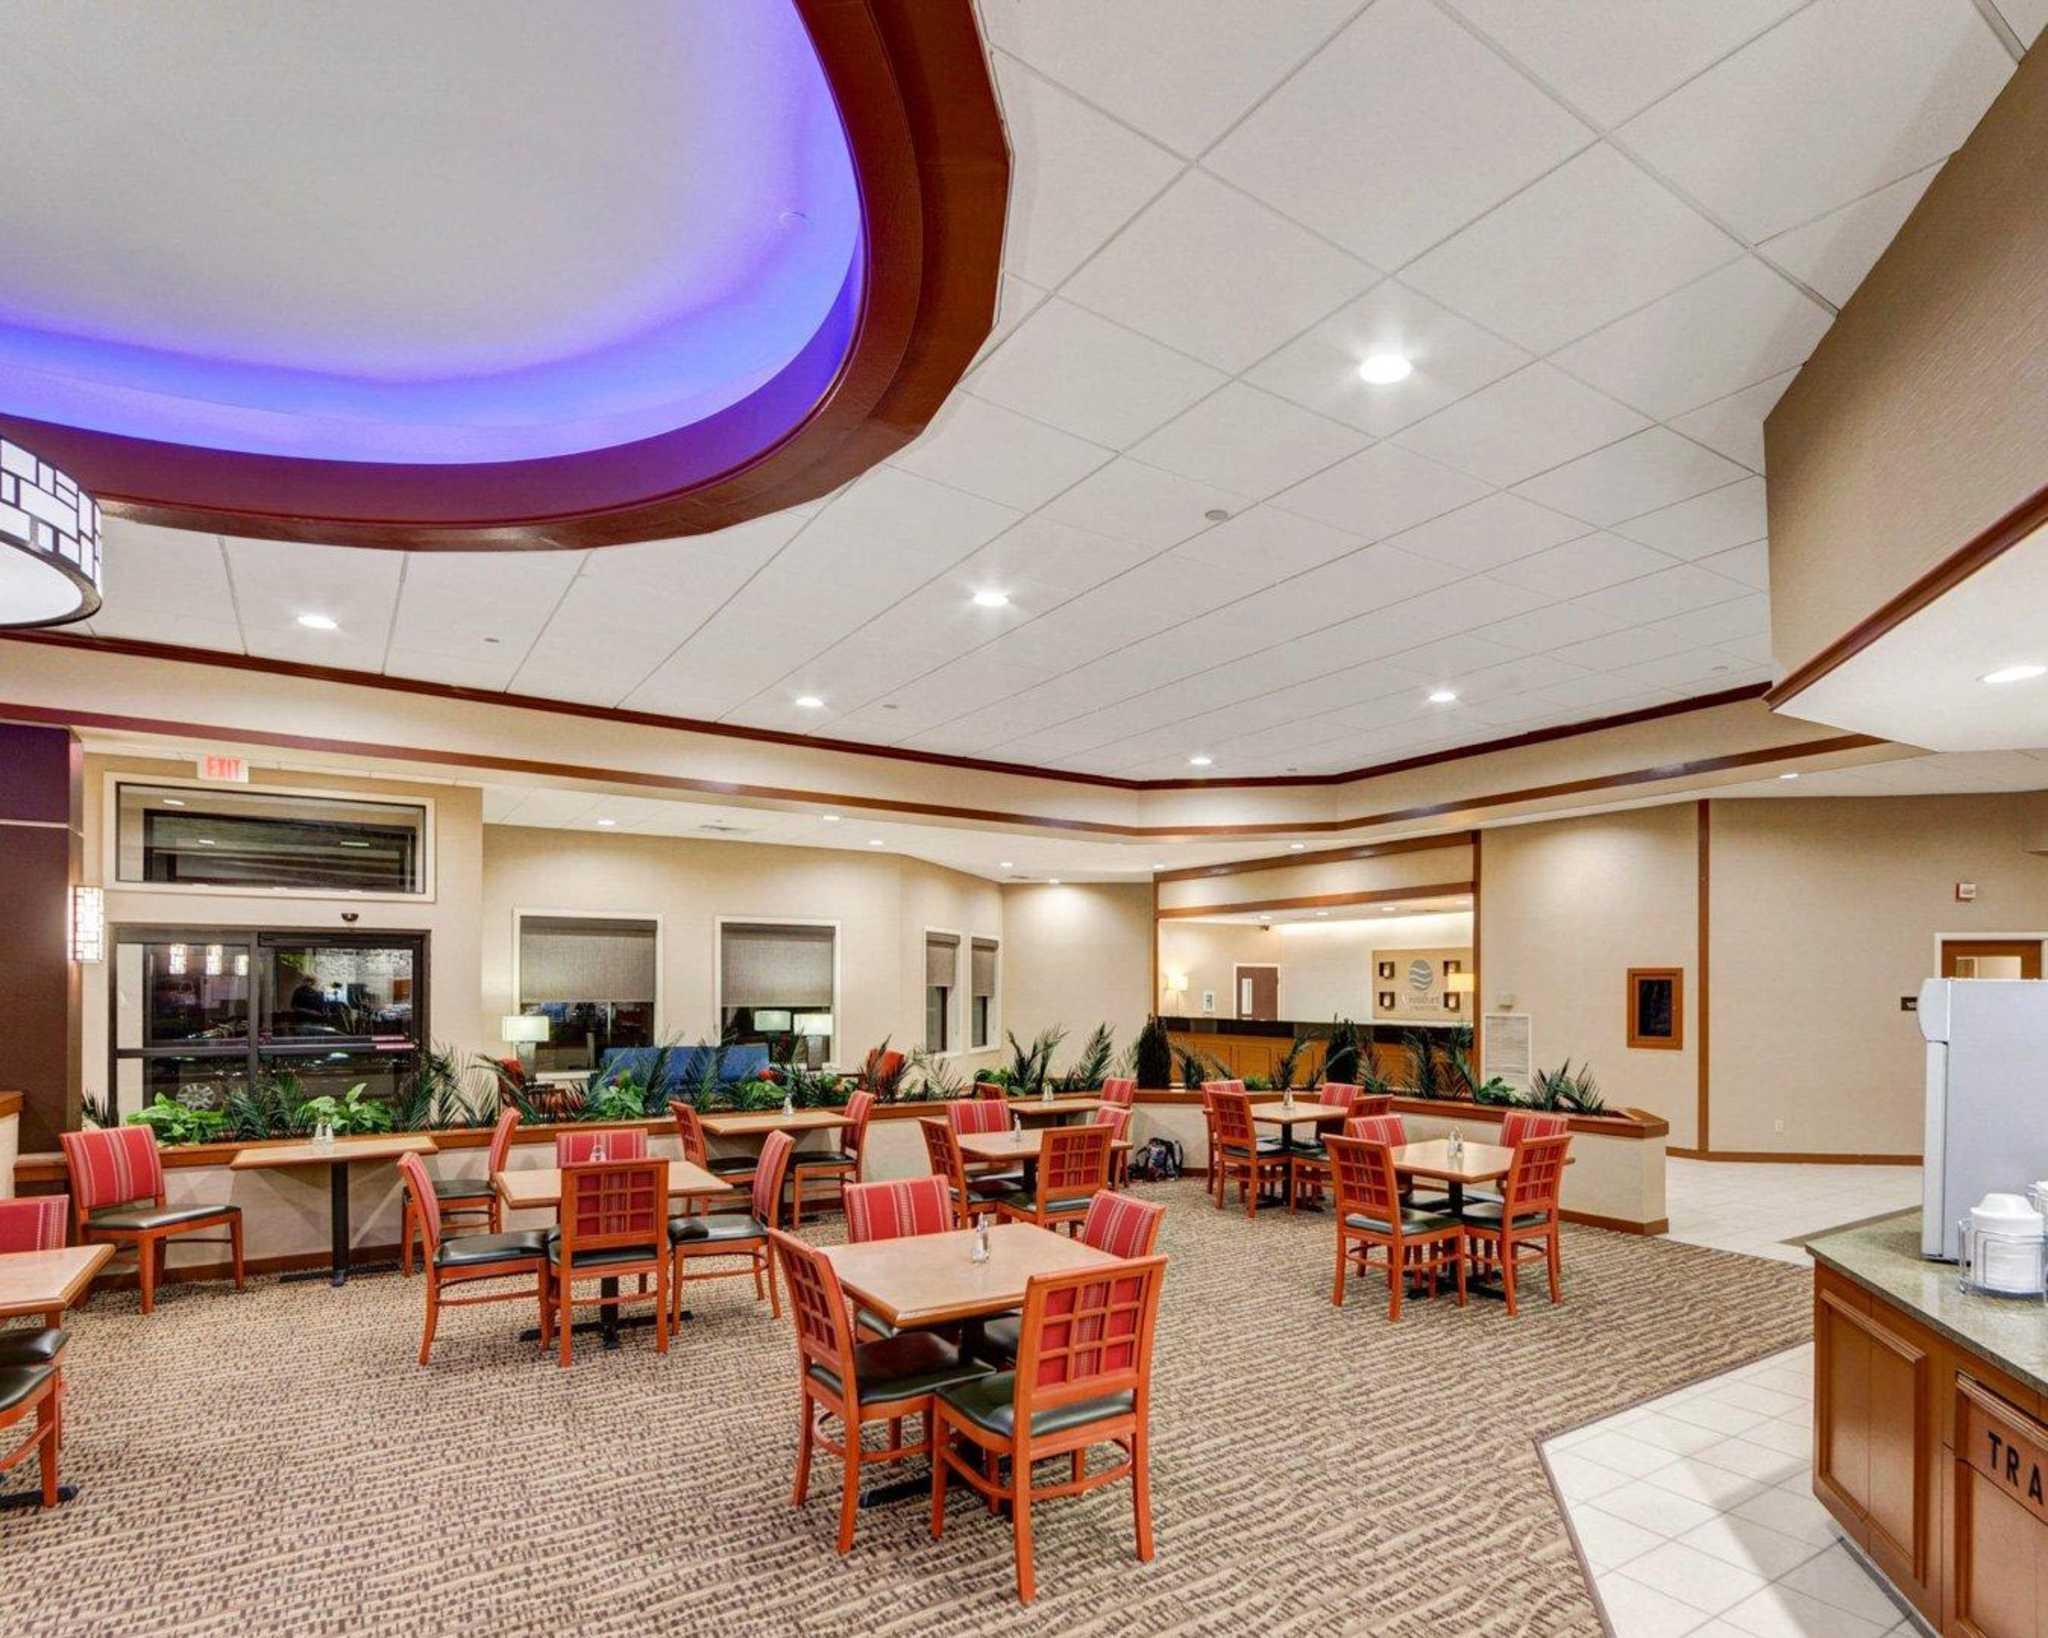 Comfort Inn & Suites Plano East image 35